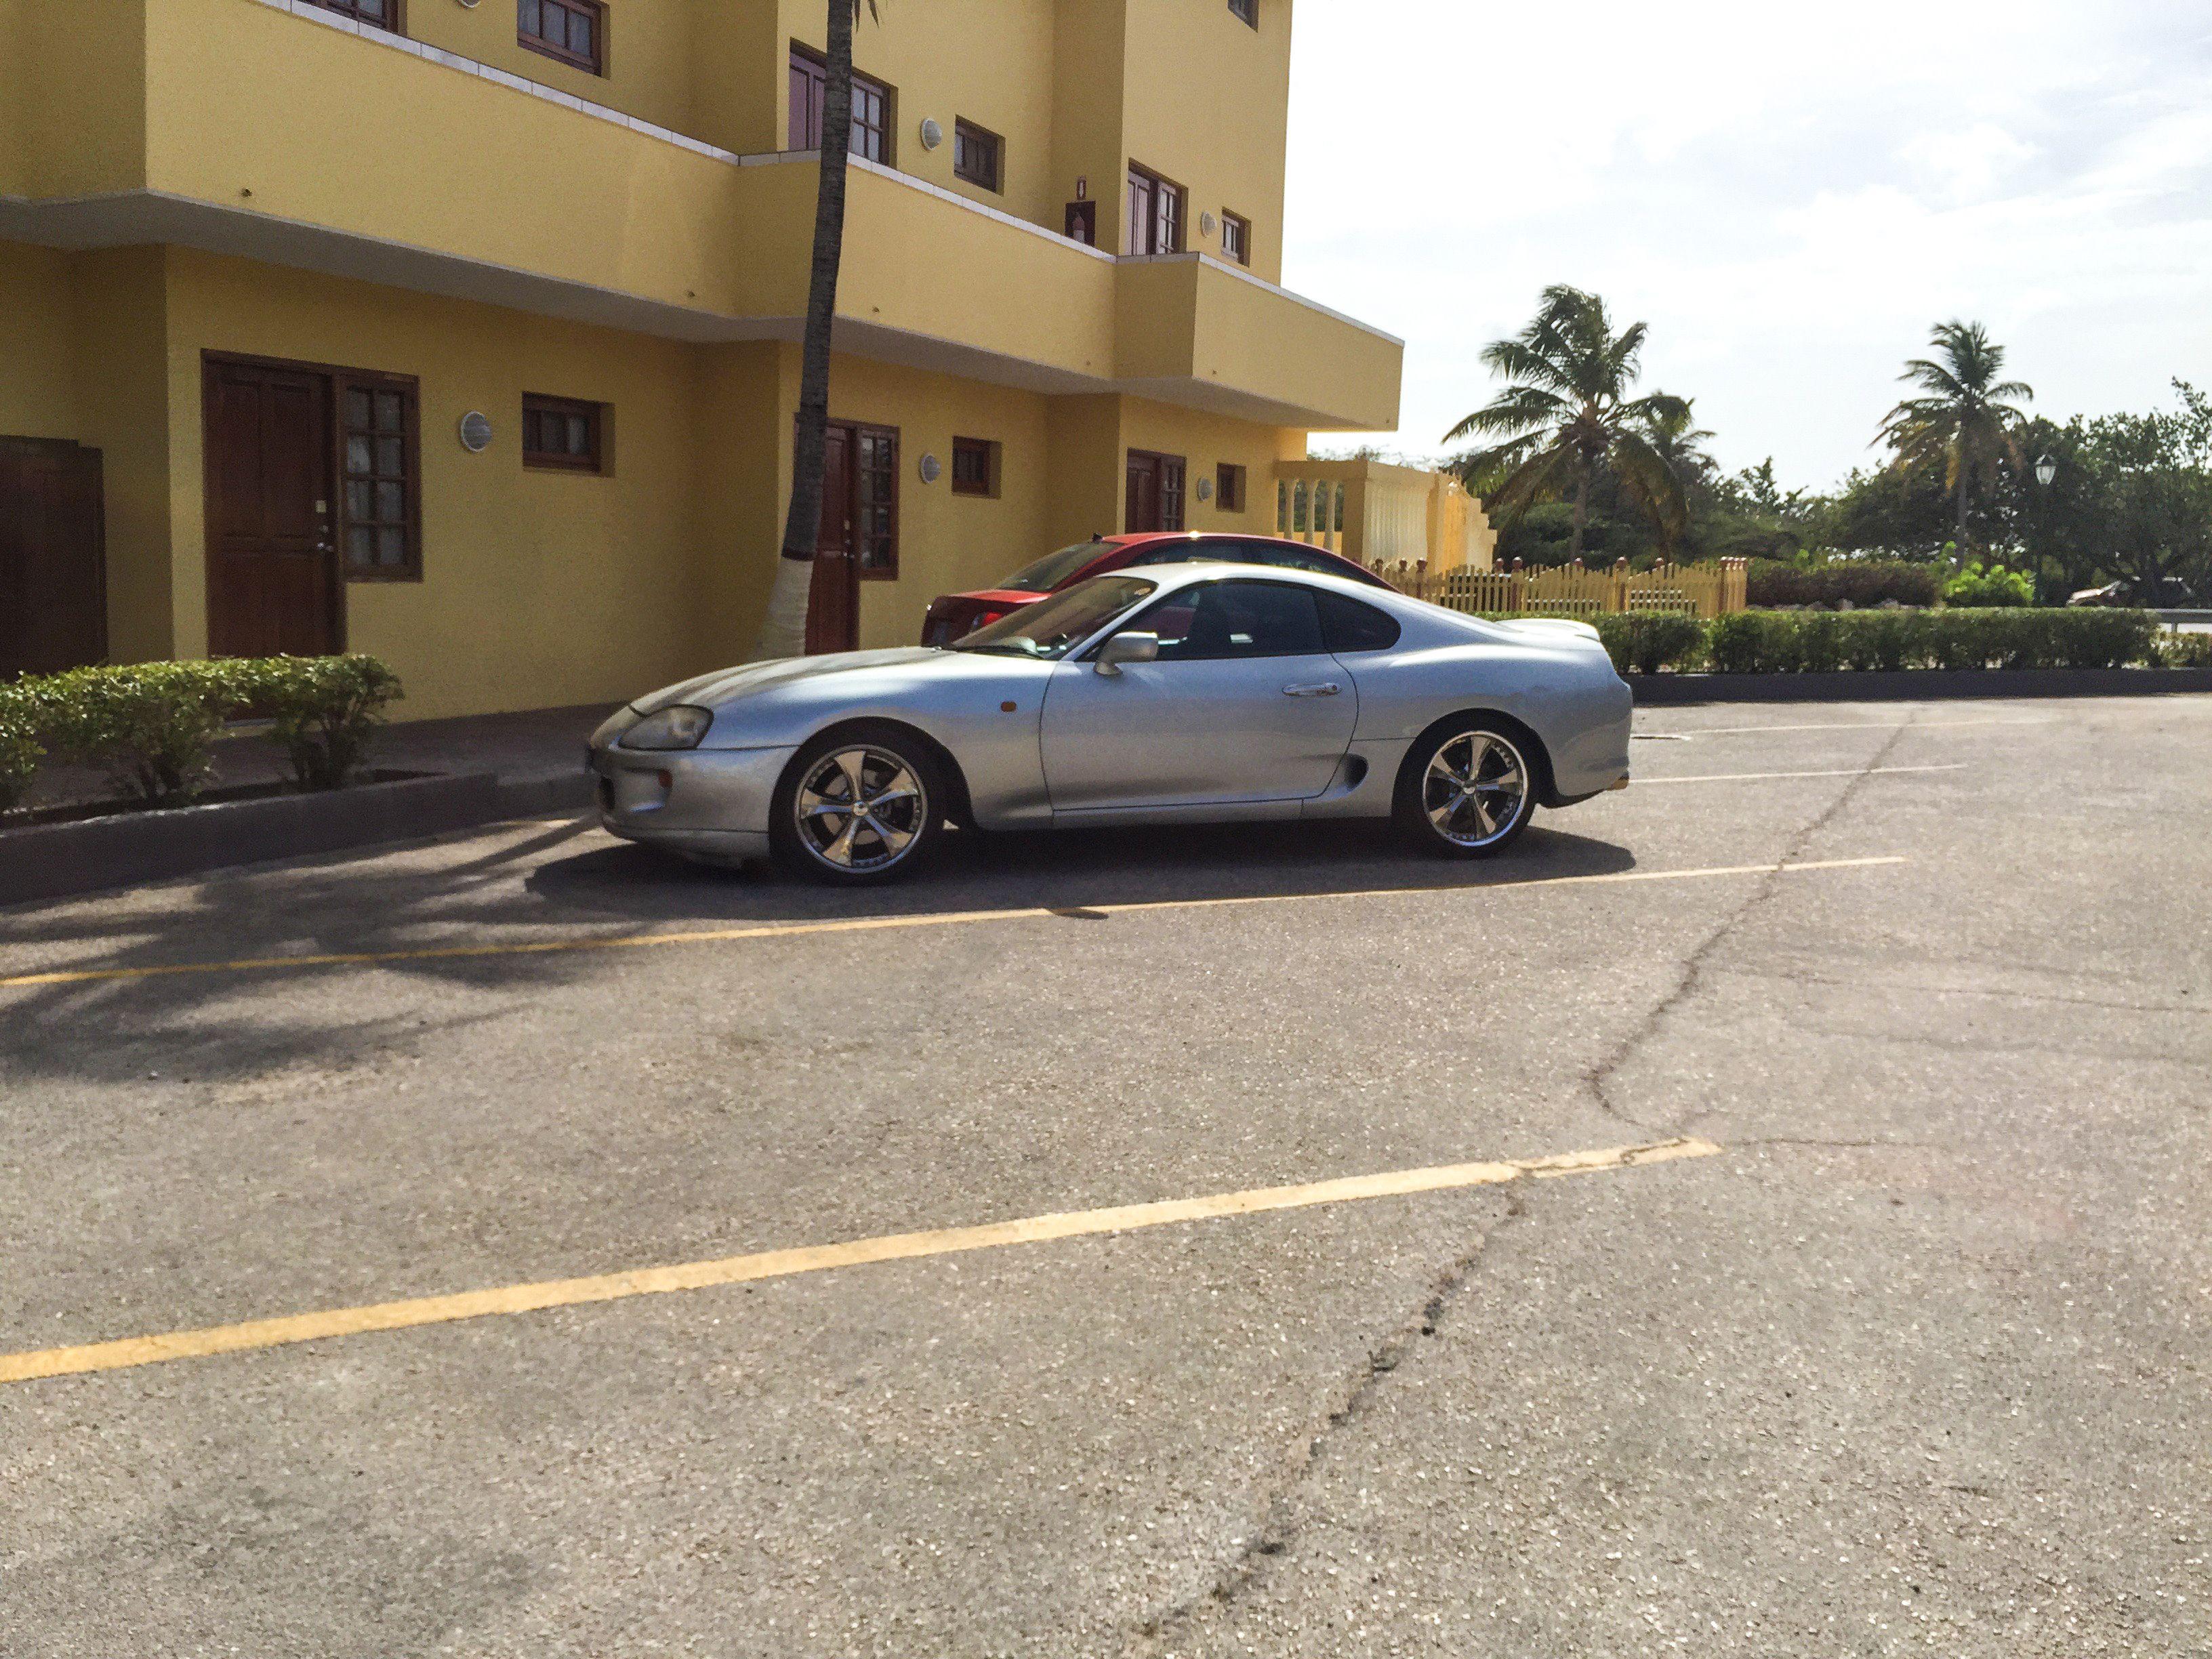 Toyota Supra #supra Http://www.losfizz.com | JDM Cars Of Aruba | Pinterest  | Jdm Cars, Toyota Supra And Jdm